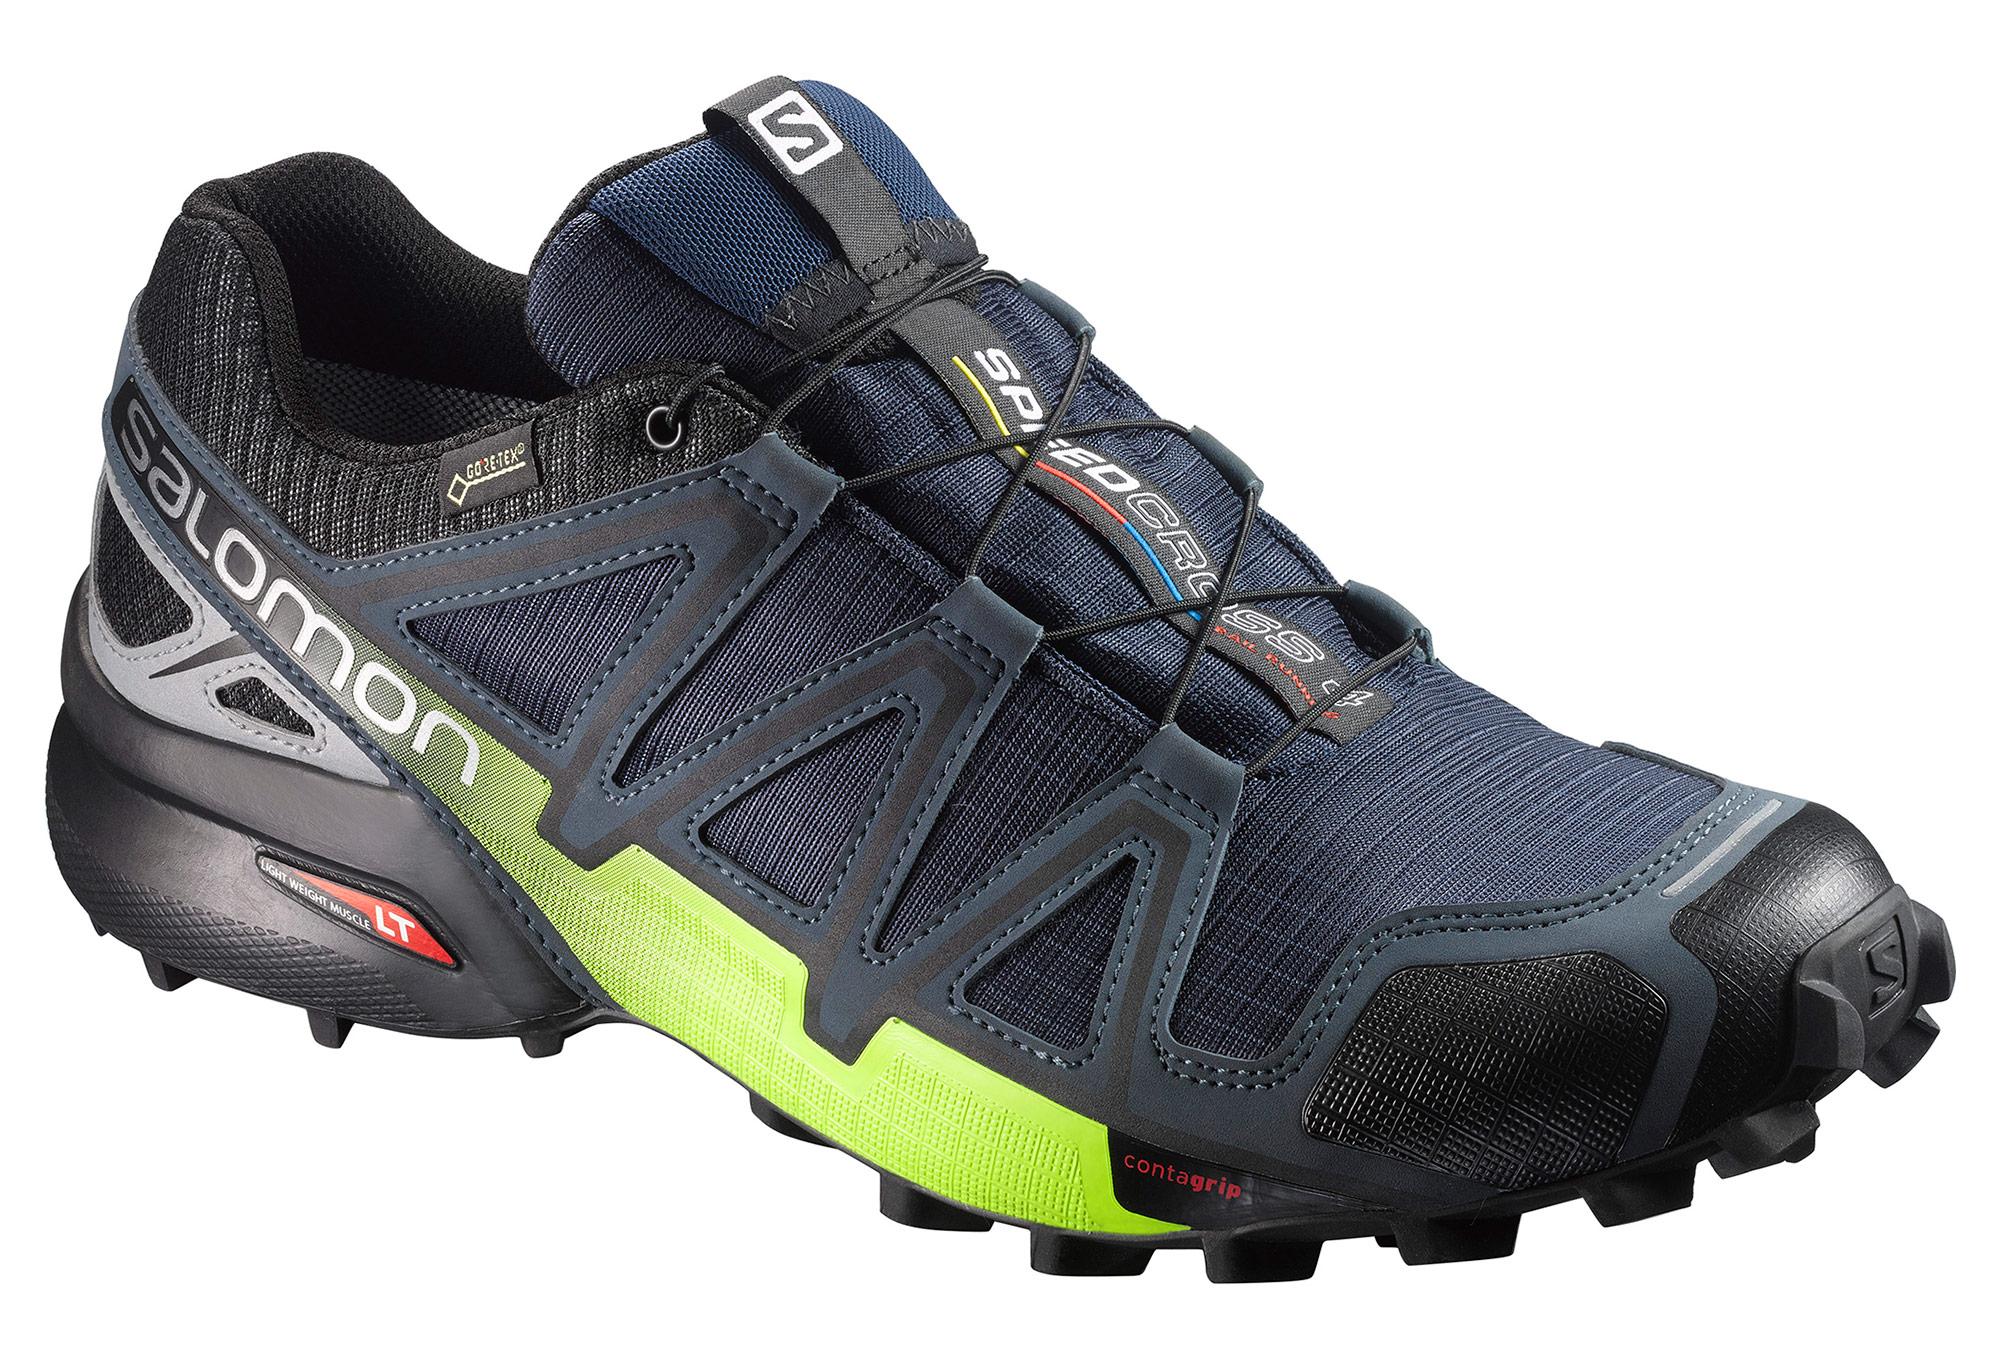 chaussures de trail salomon speedcross 4 nocturne gtx bleu jaune fluo. Black Bedroom Furniture Sets. Home Design Ideas